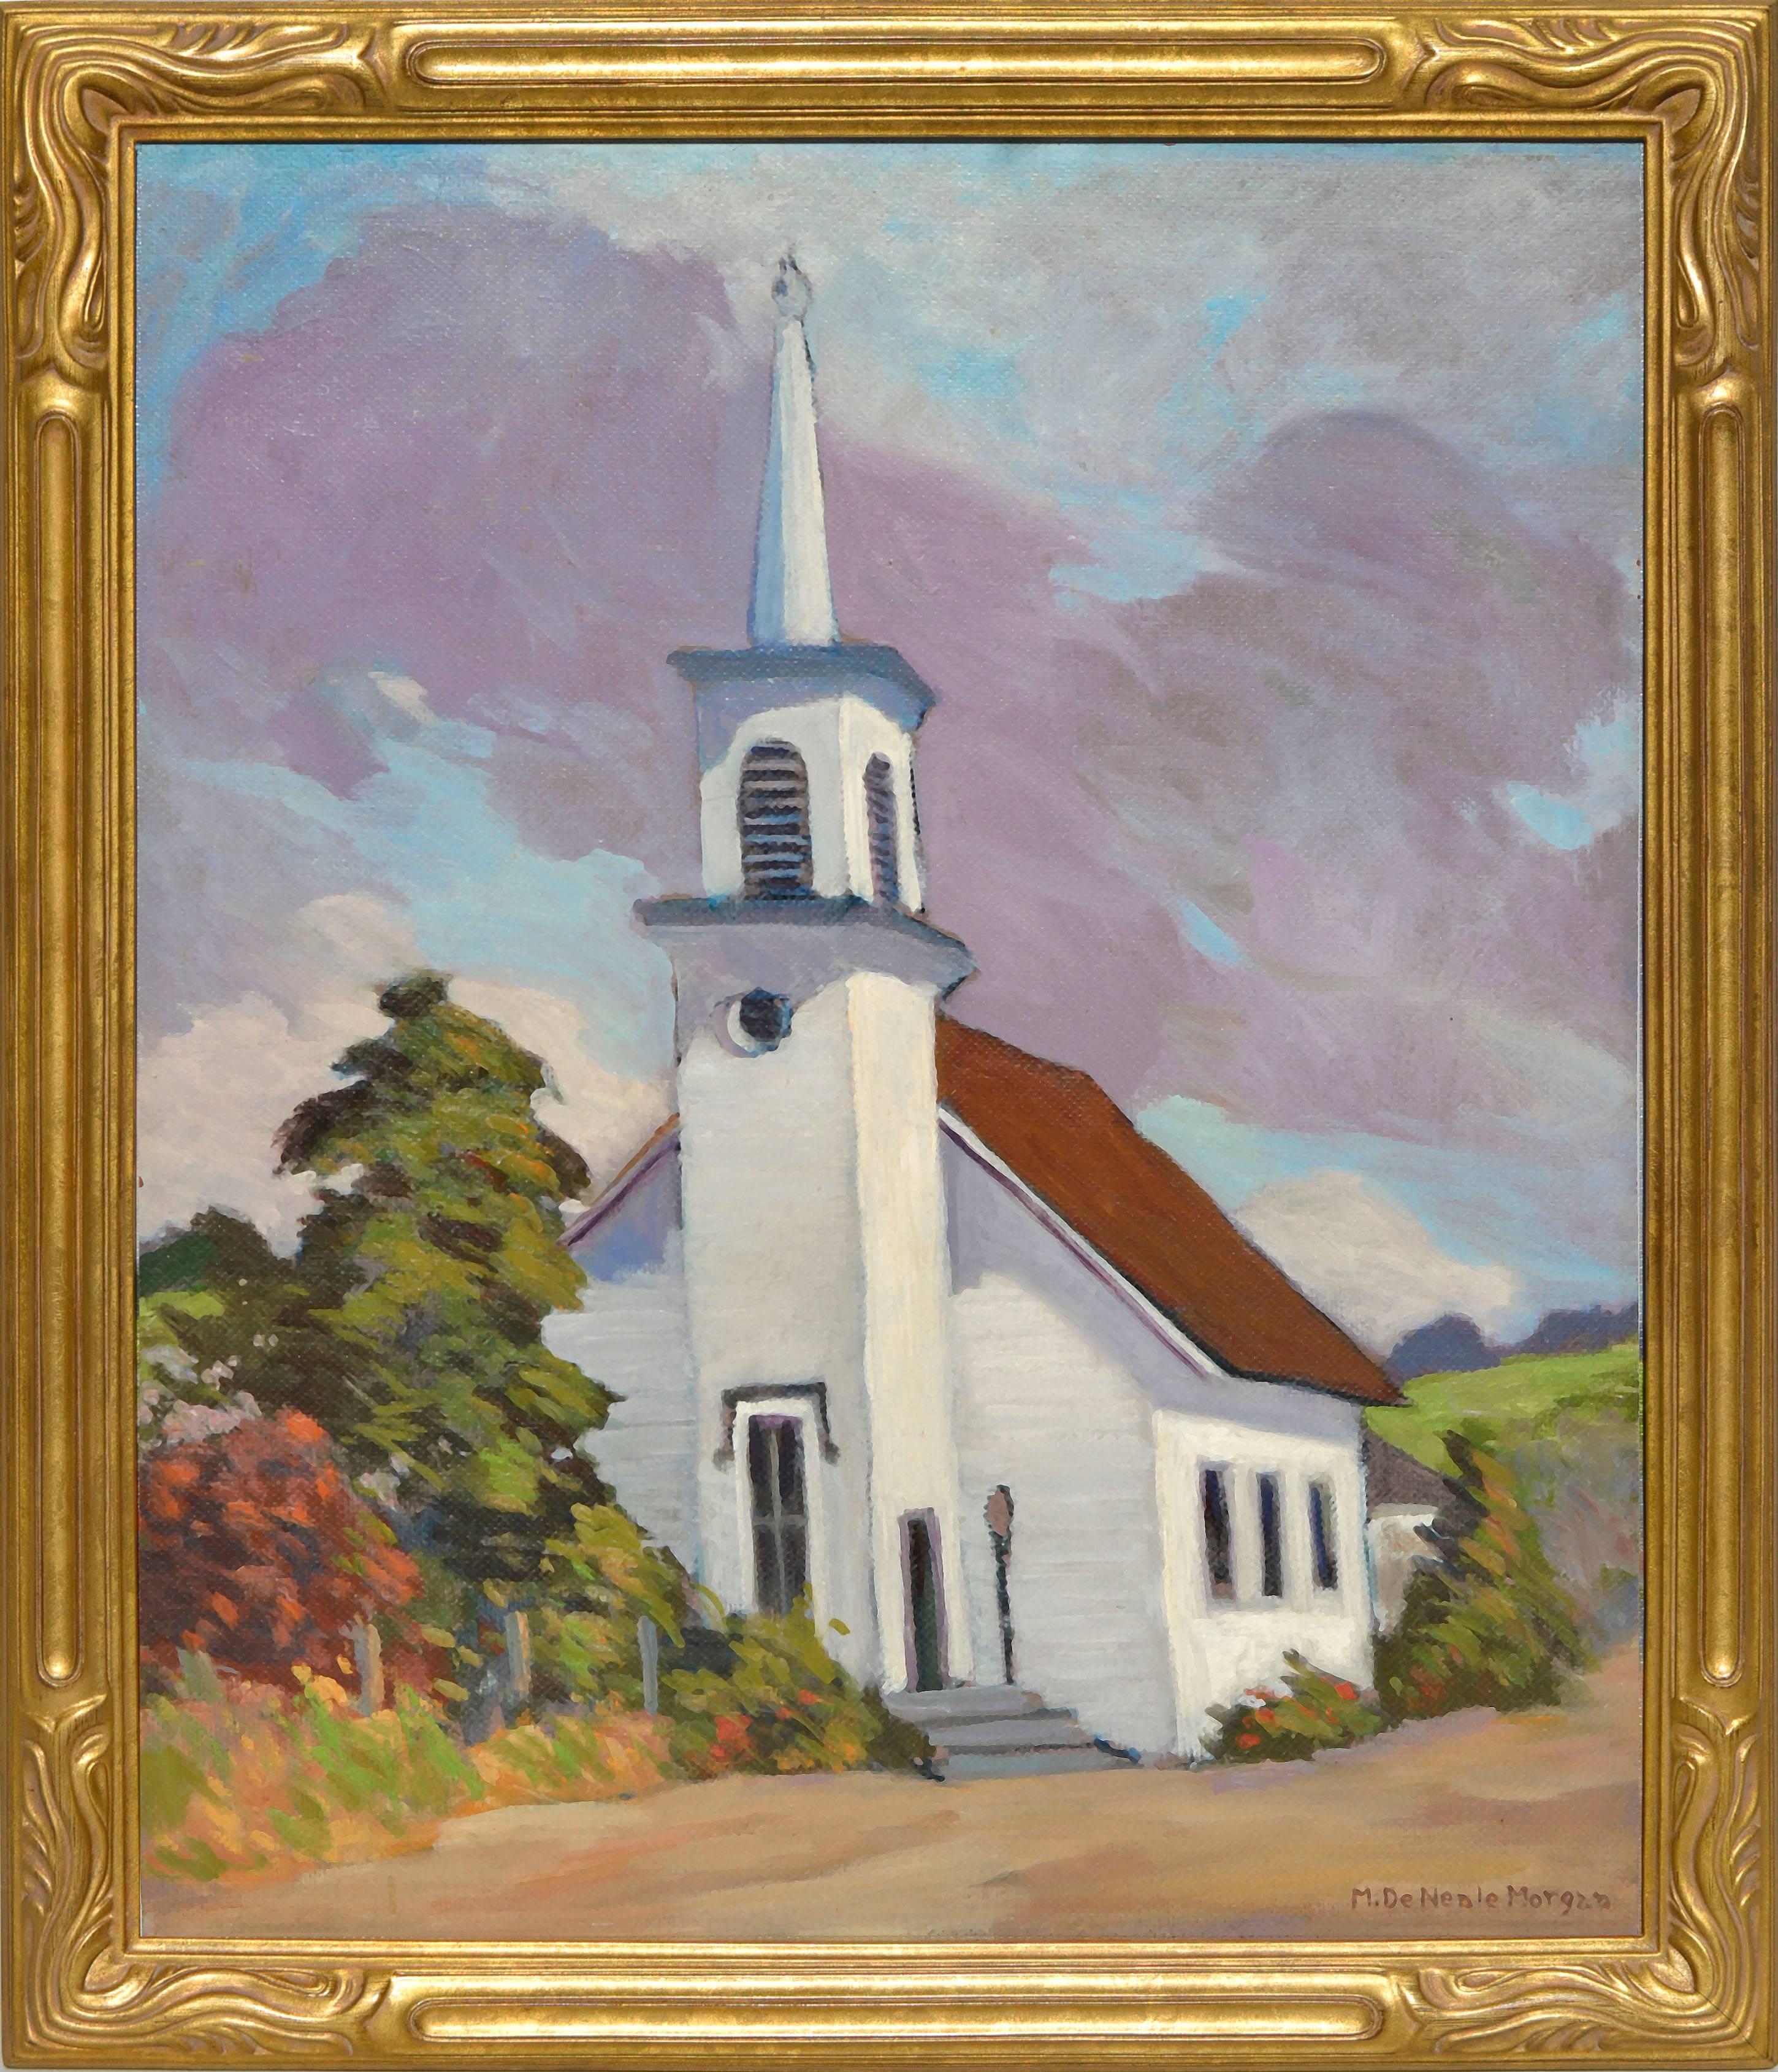 Congregational Church of Soquel, California by Mary DeNeale Morgan 1920